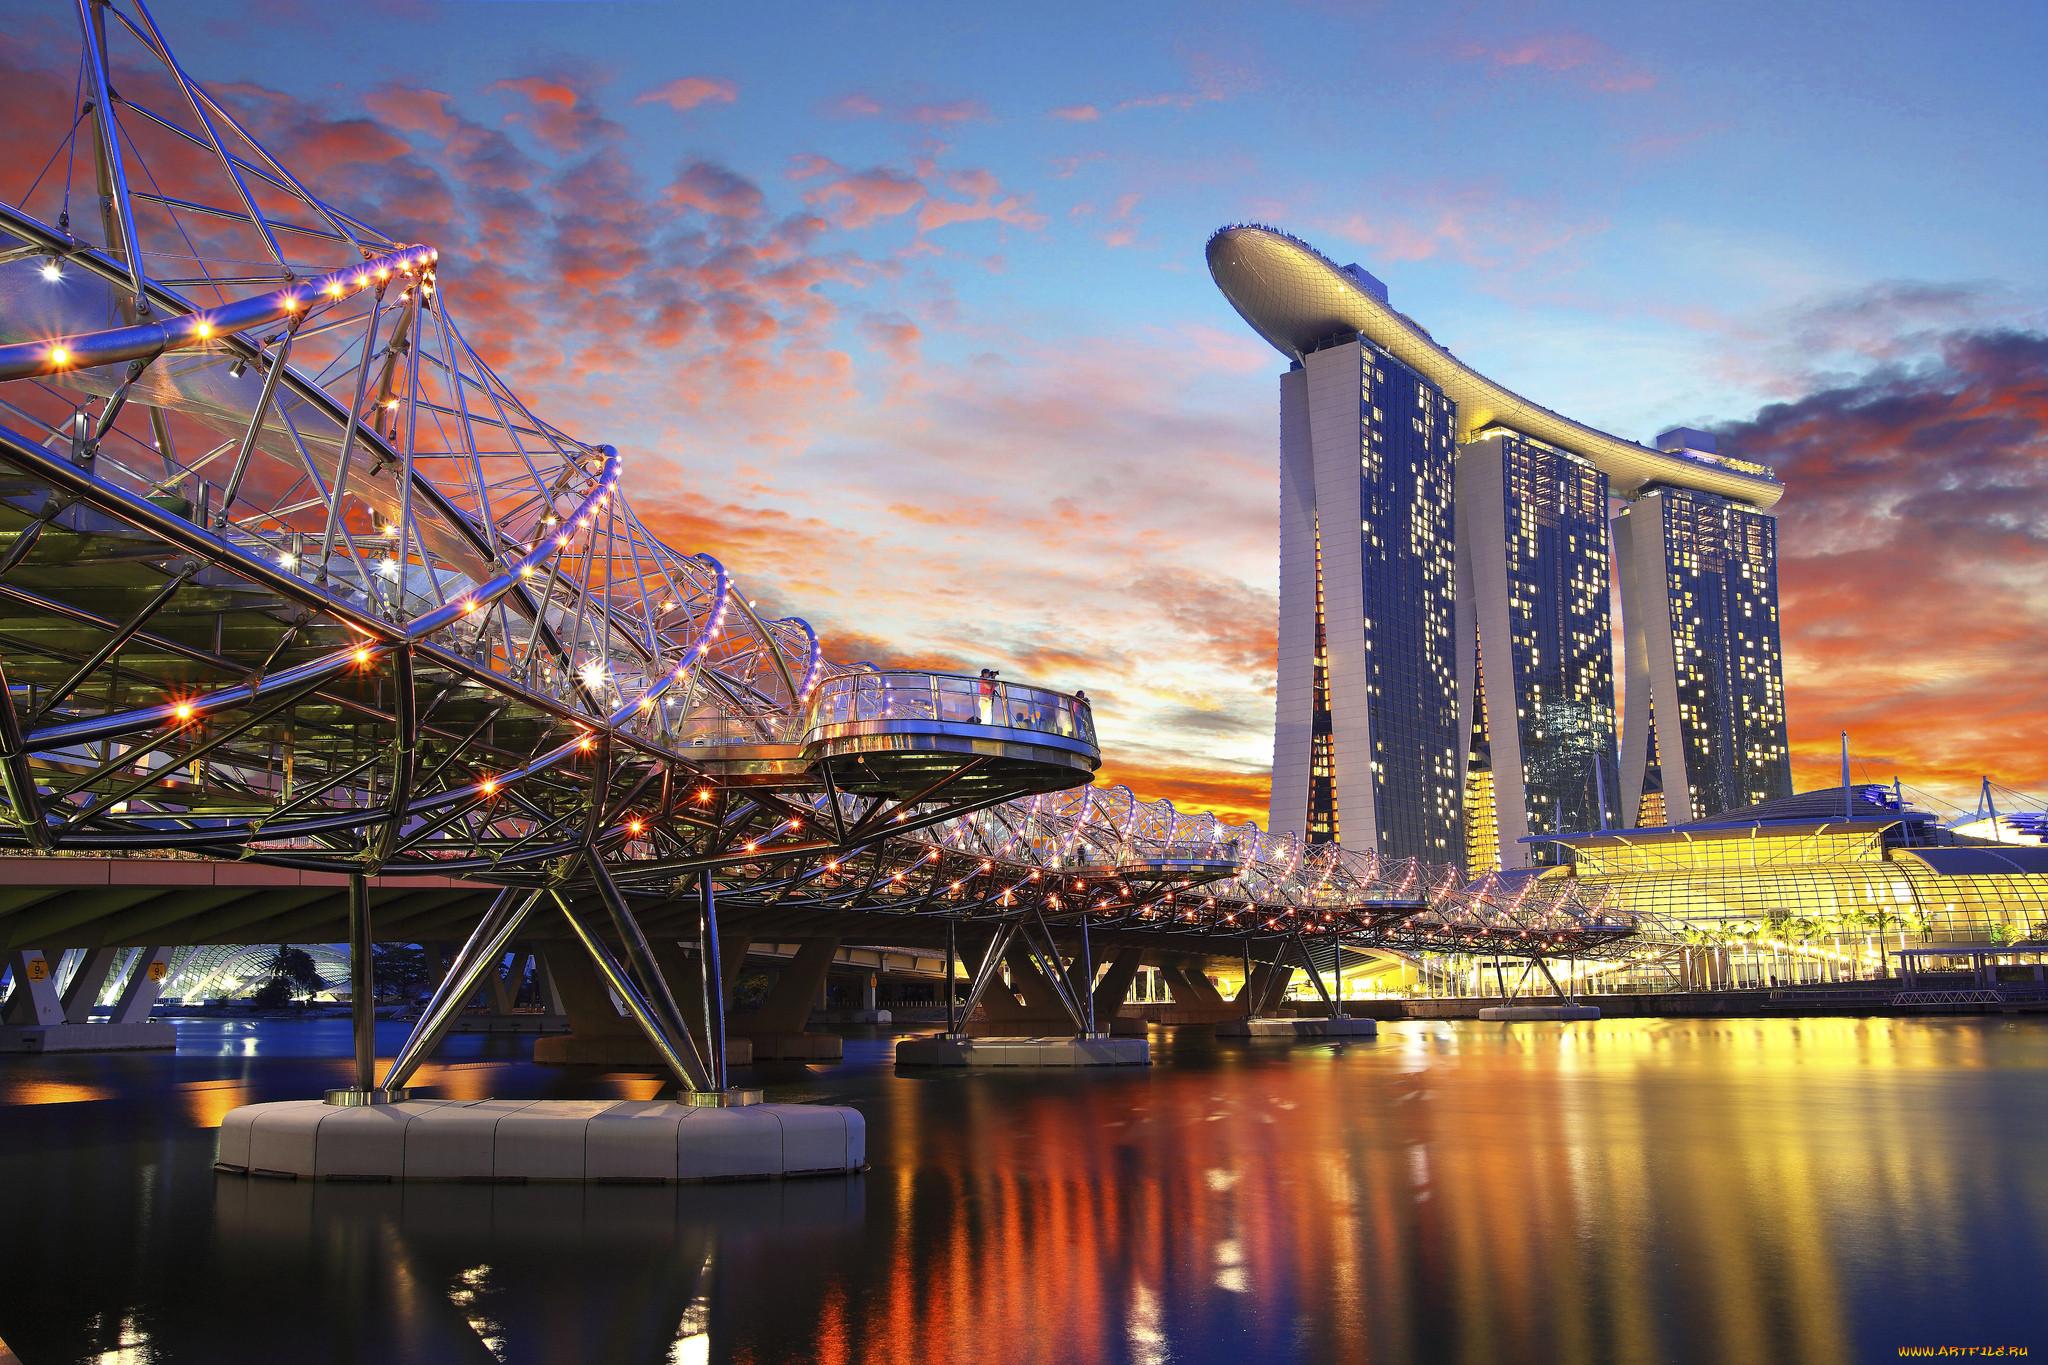 консистенции какой-то сингапур город фото предназначены